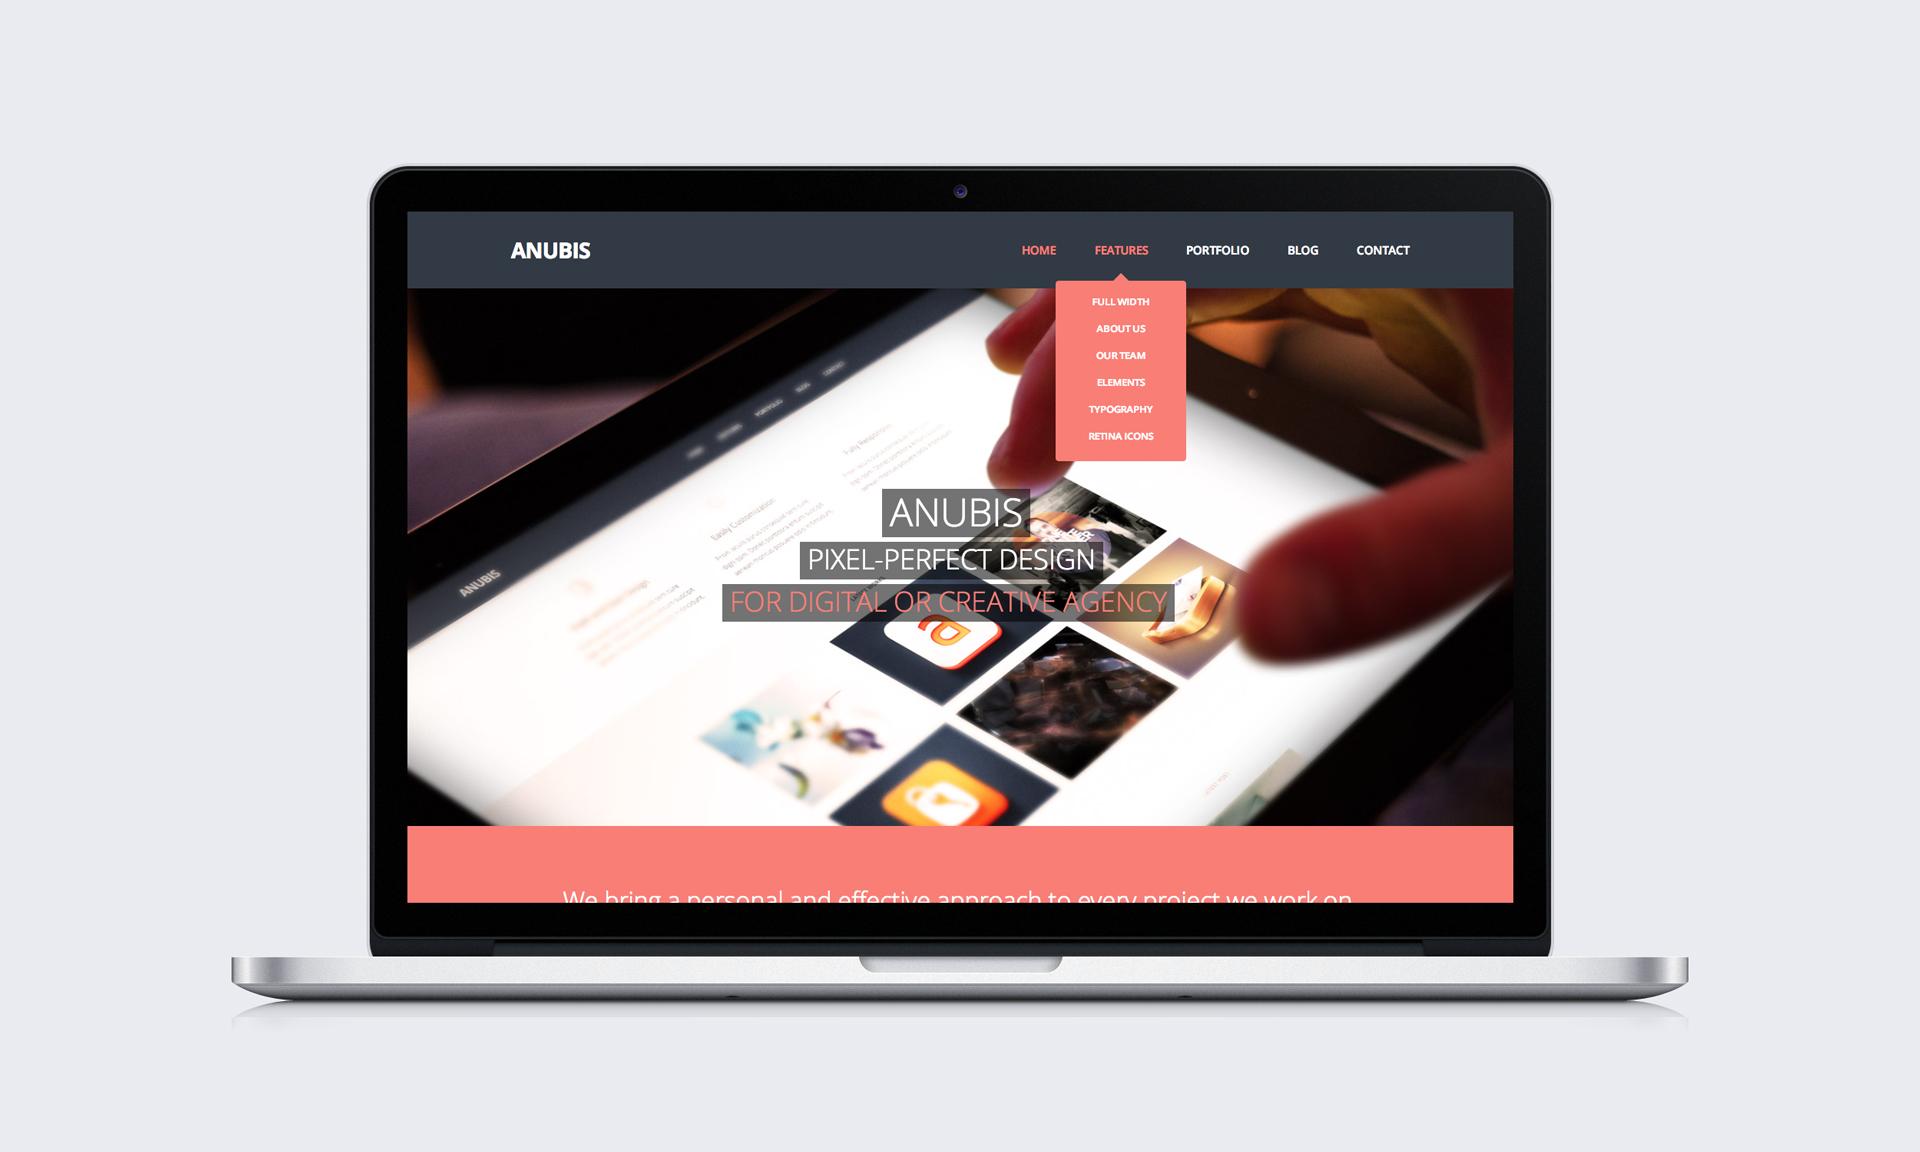 anubis-macbook